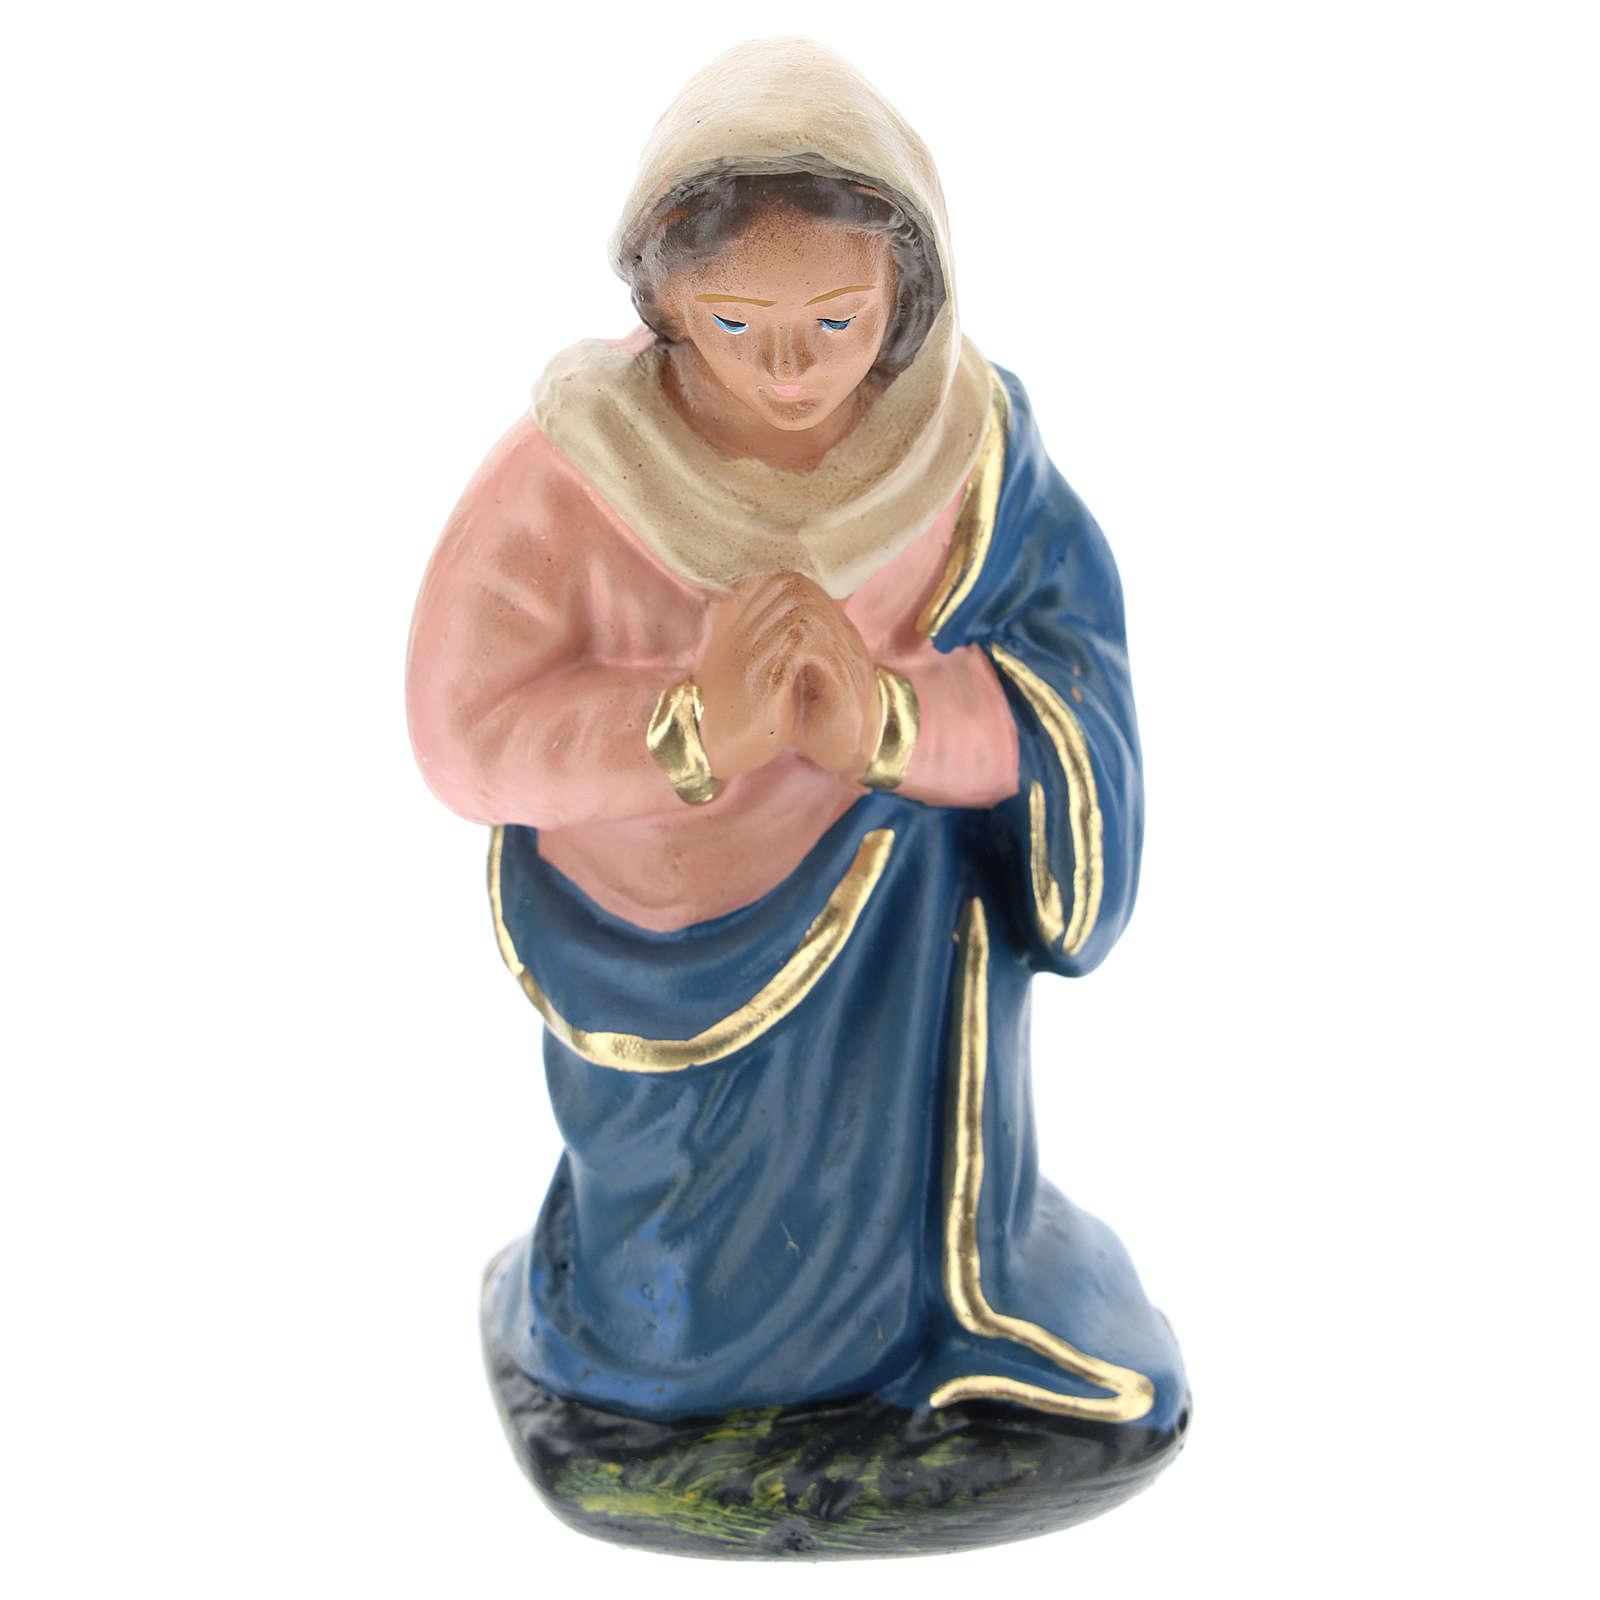 Estatua Virgen de rodillas yeso para belén 10 cm Arte Barsanti 4